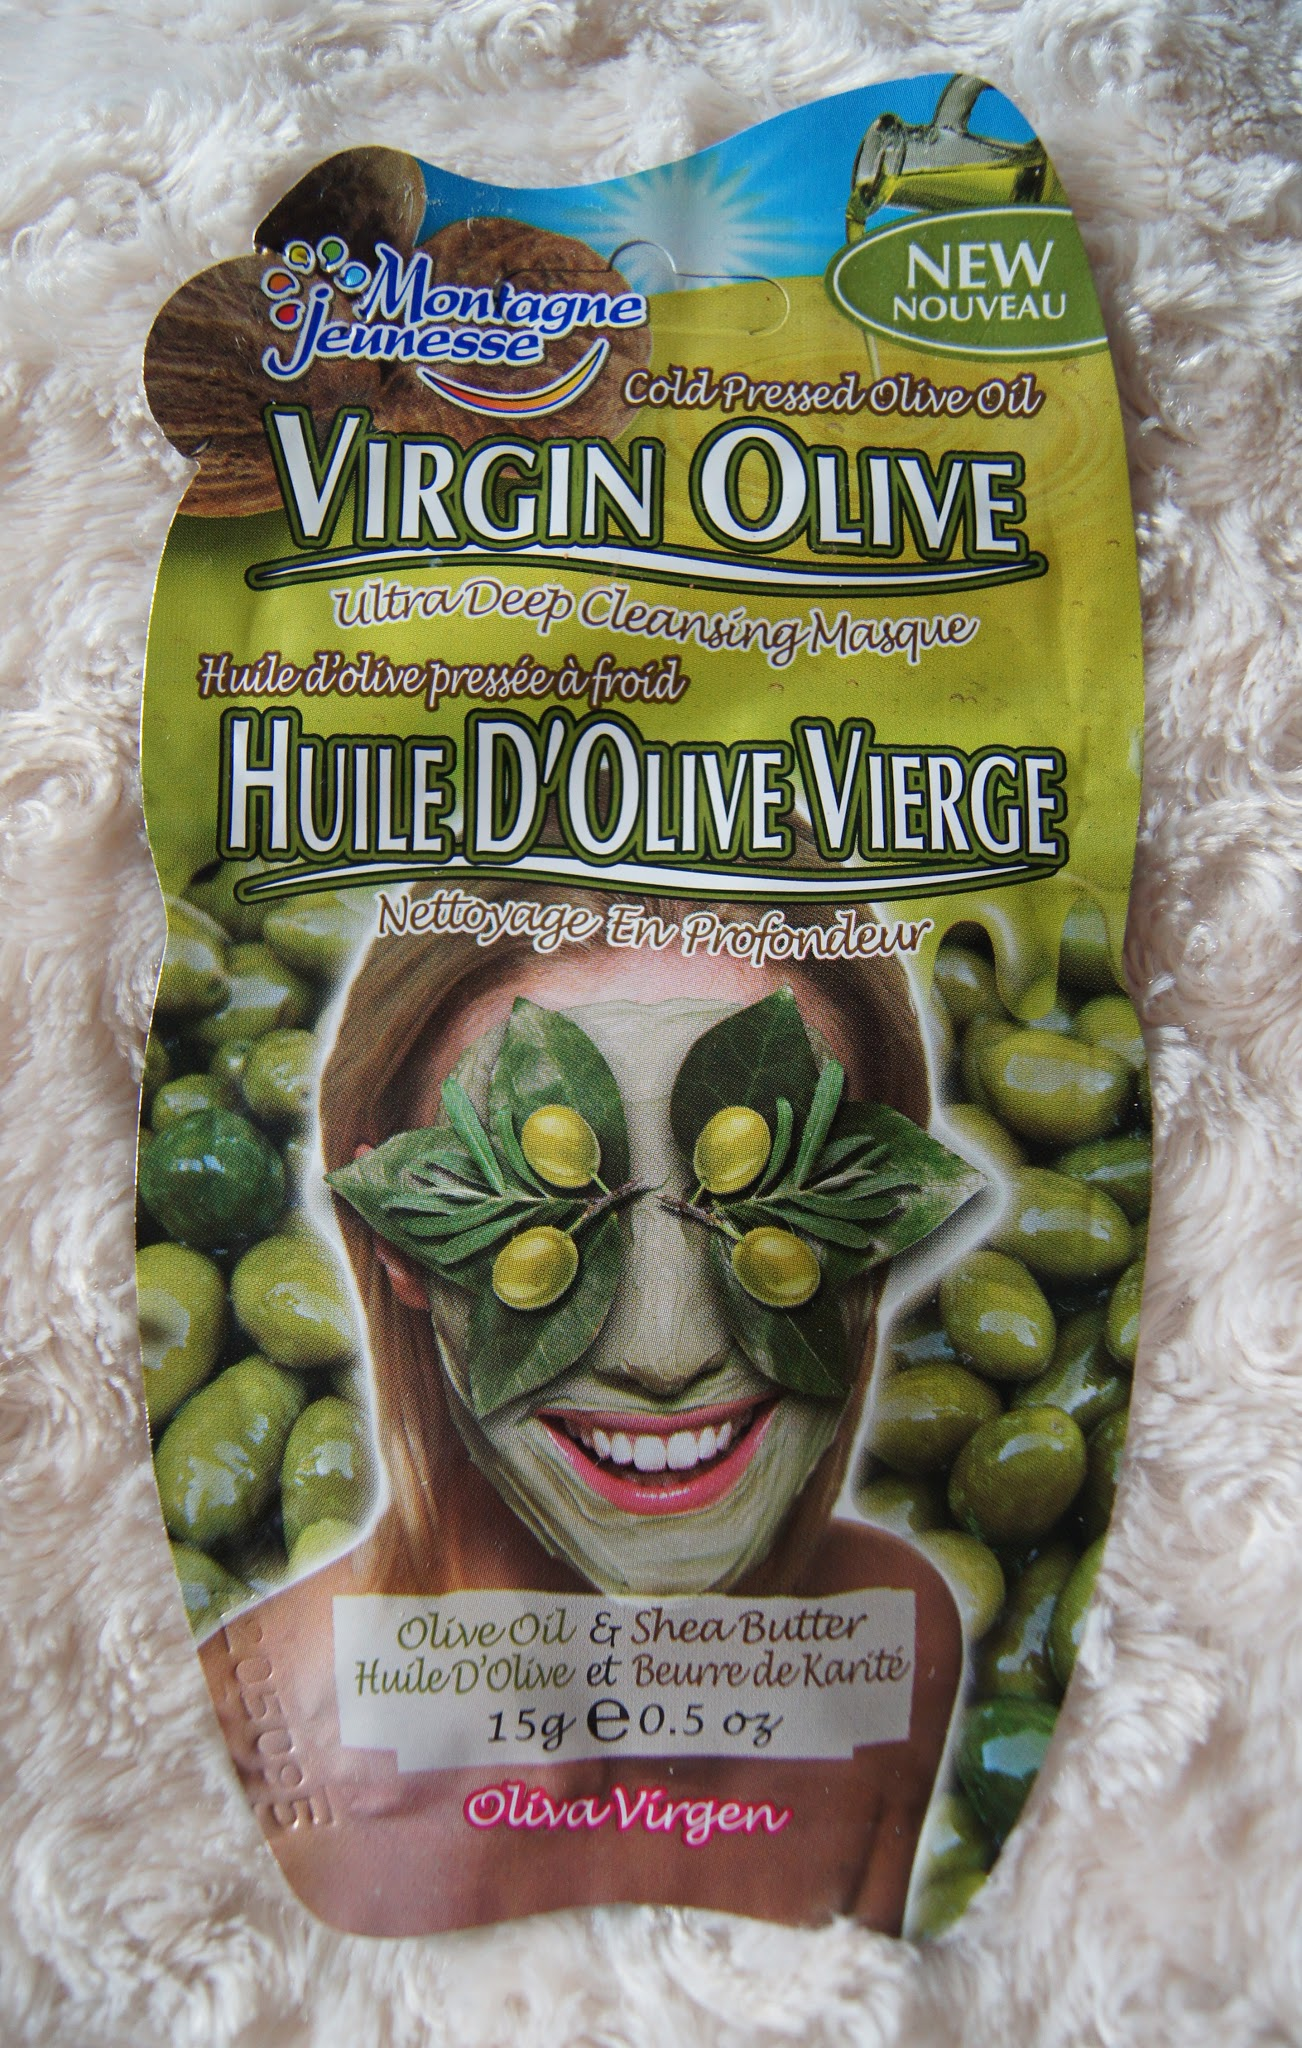 montagne jeunesse virgin olive face mask review